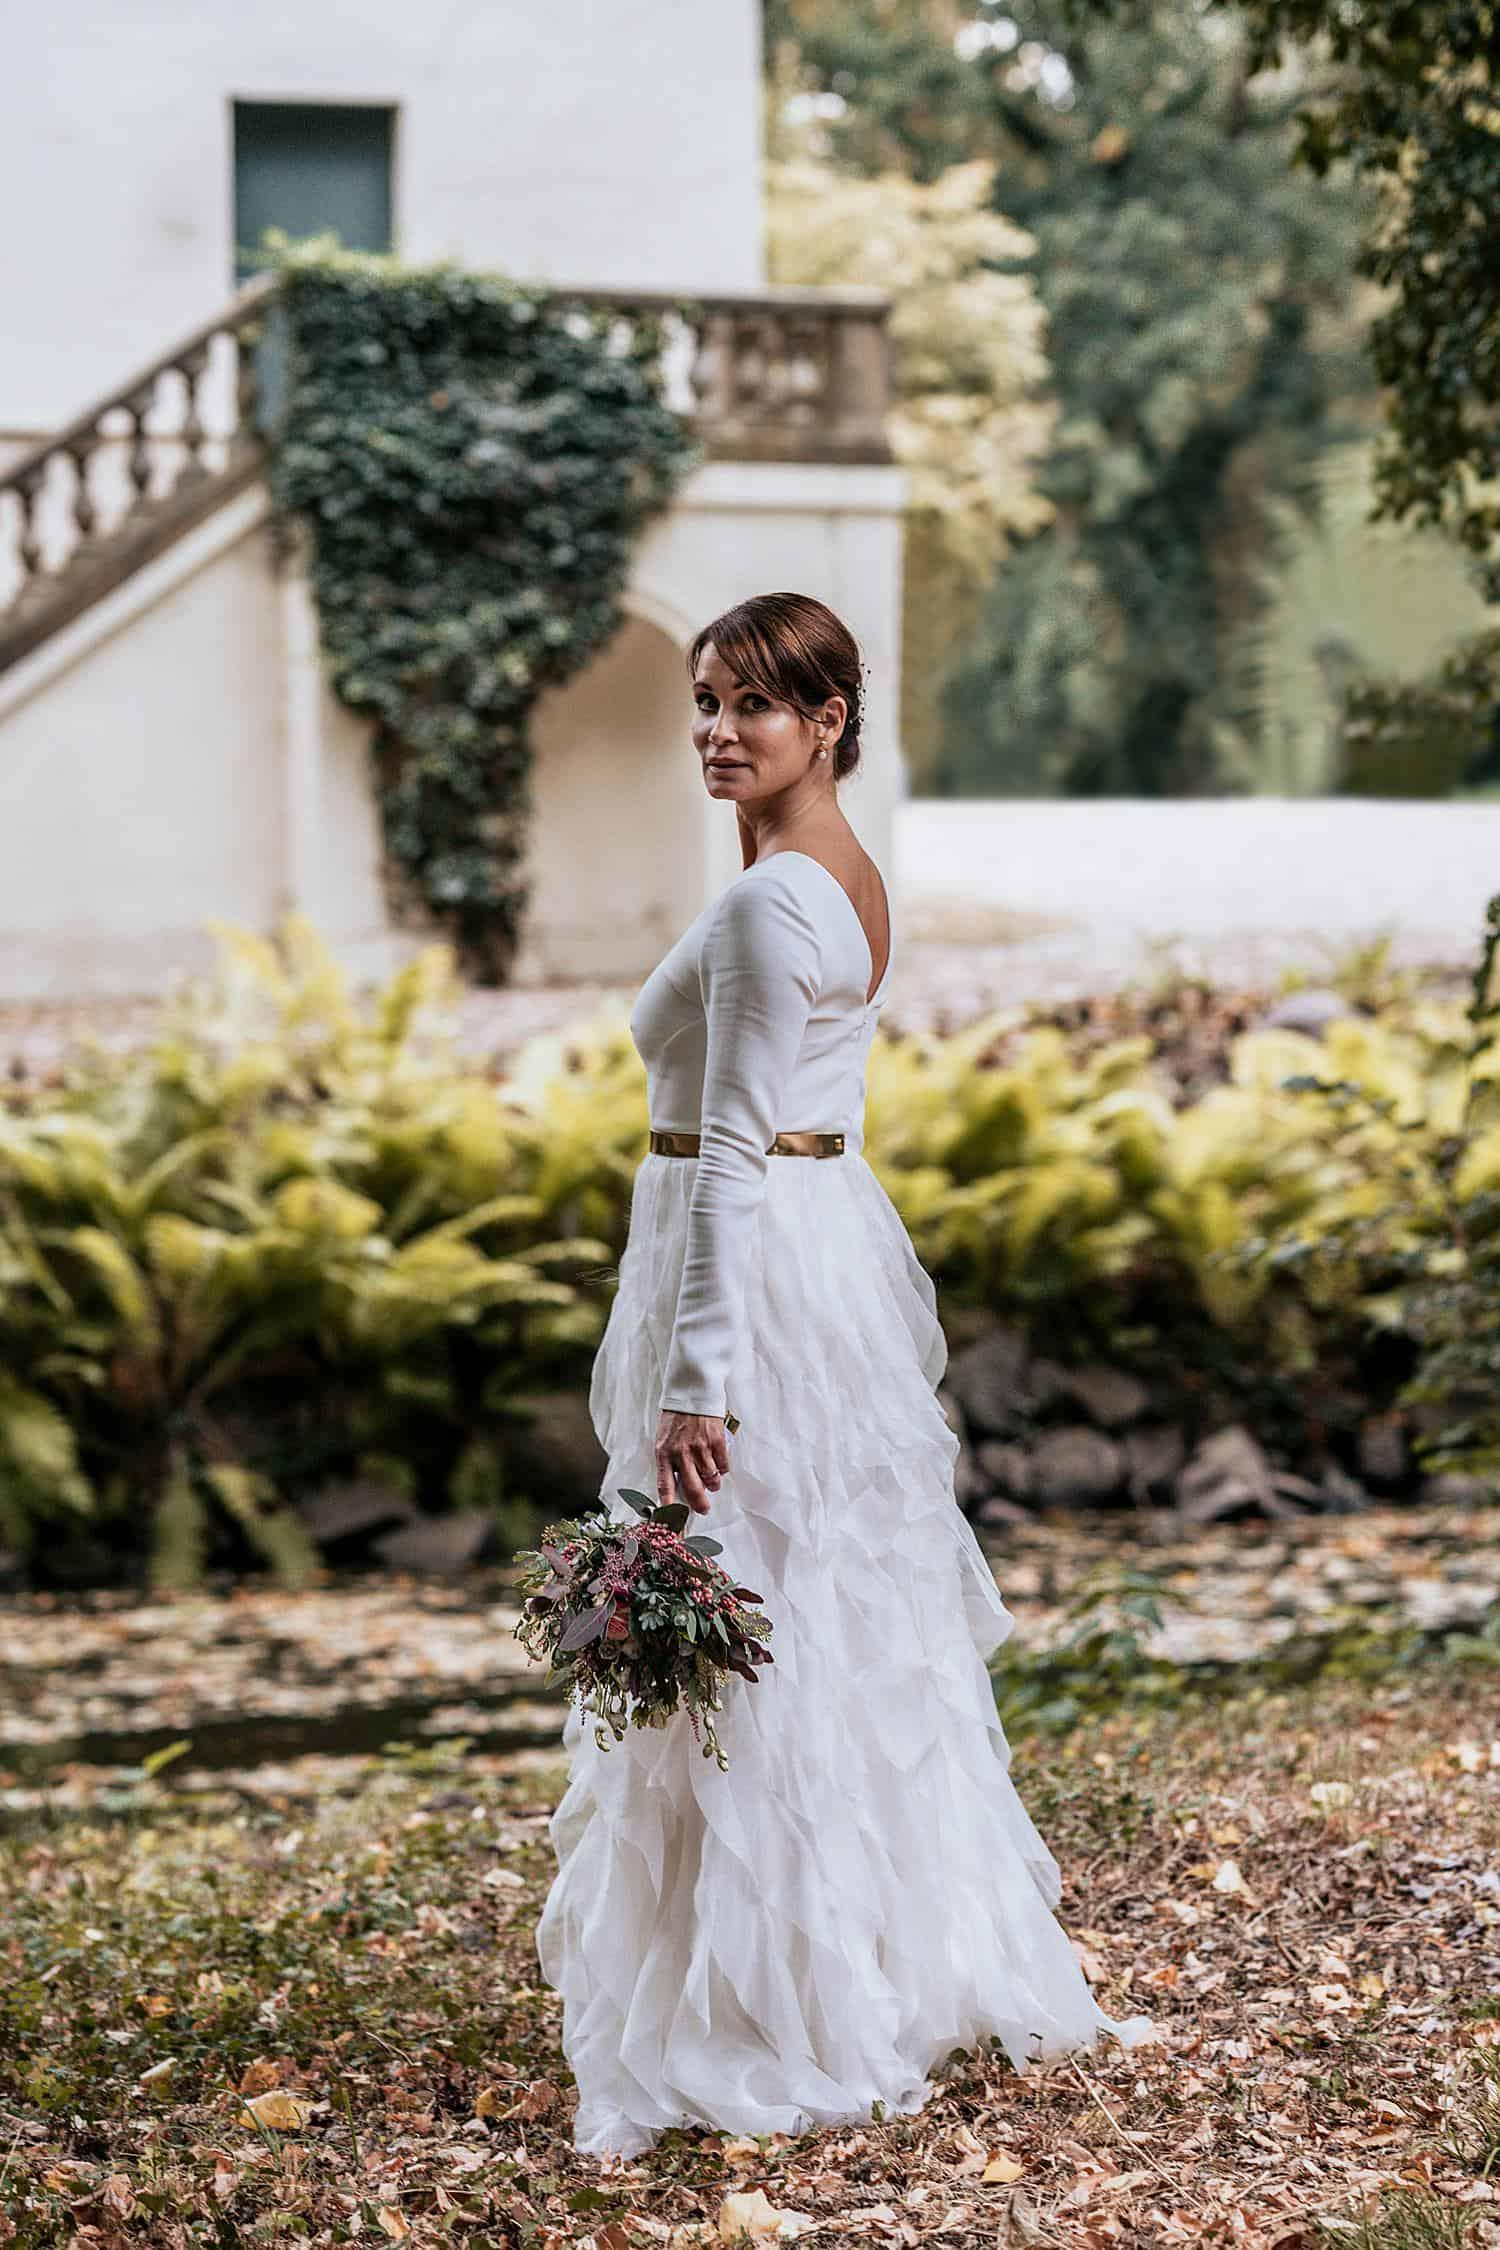 Anja Kling Hochzeit Schloss Blankensee - Hochzeitsfotograf Berlin Vasil Bituni